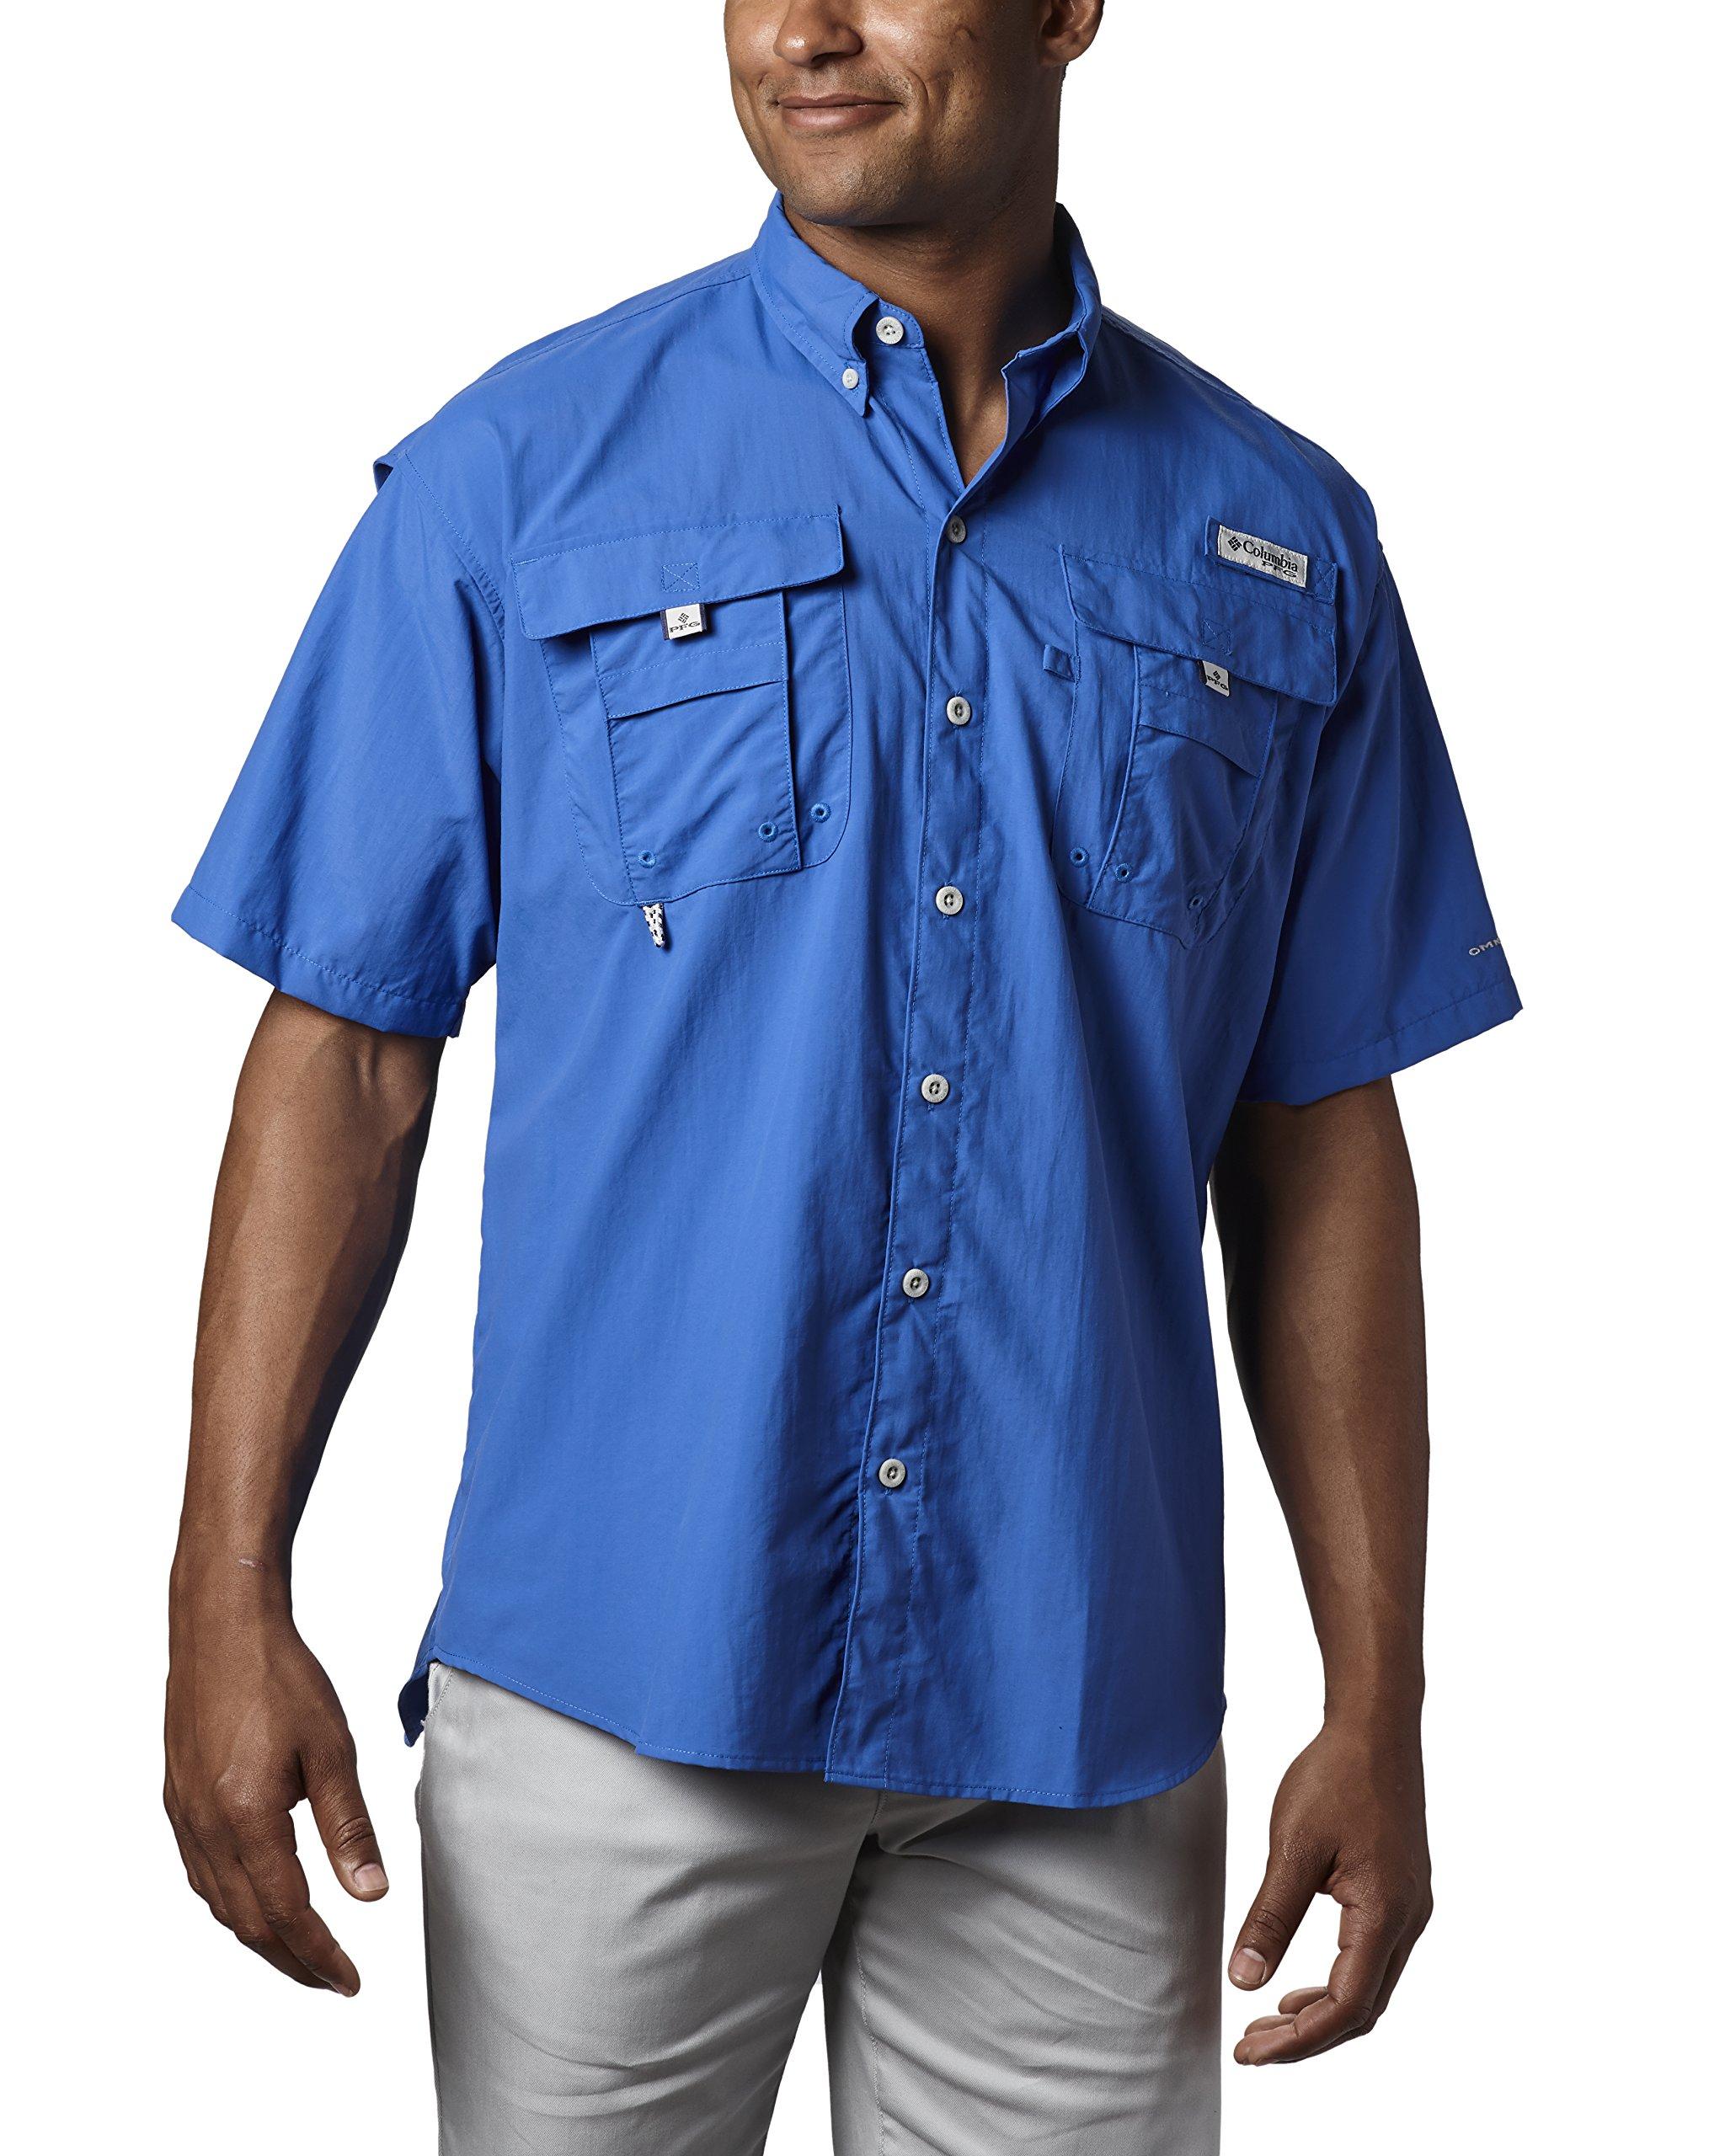 Columbia Men's Bahama II Short Sleeve Shirt (X-Large, Vivid Blue)